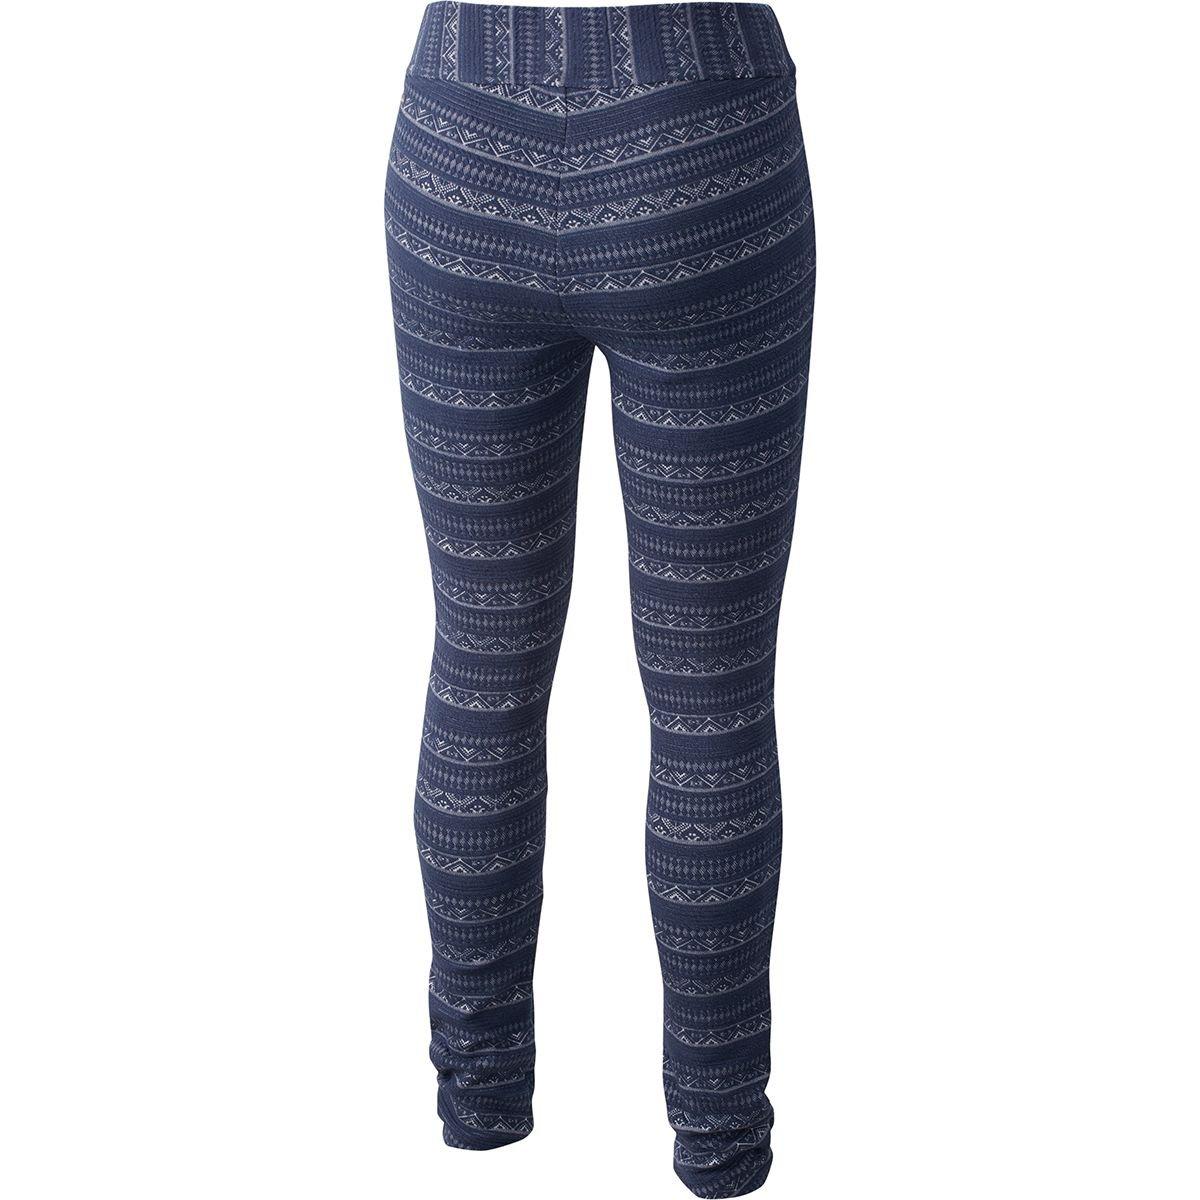 7a1f8607ff8aa6 Columbia Women's Aspen Lodge Jacquard Legging at Amazon Women's Clothing  store: